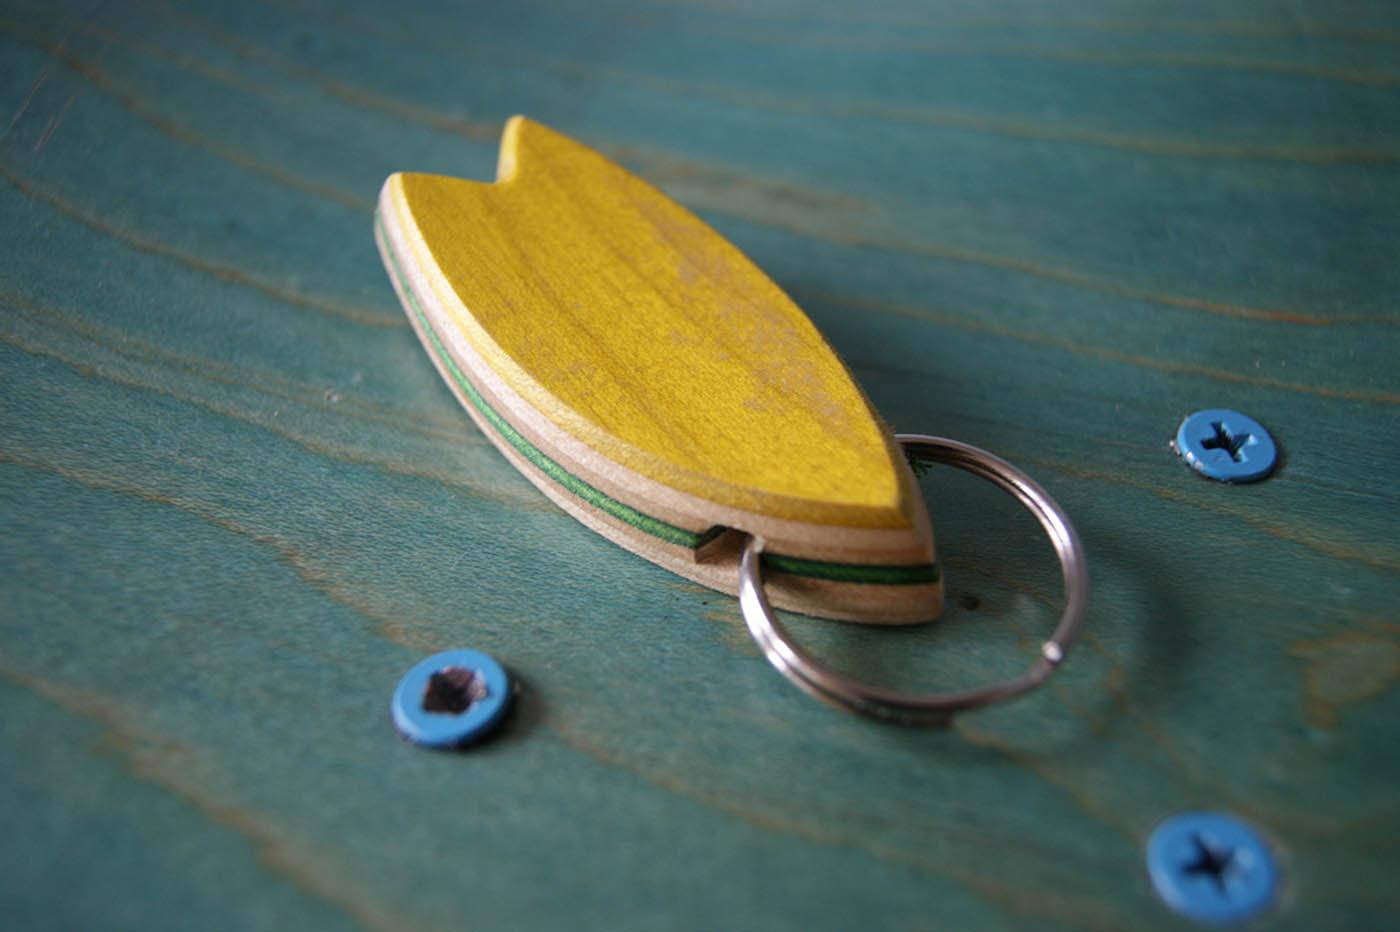 5-Skatan-LLC-Surfboard-Key-Chain-Skateboarding-Upcycling (31)